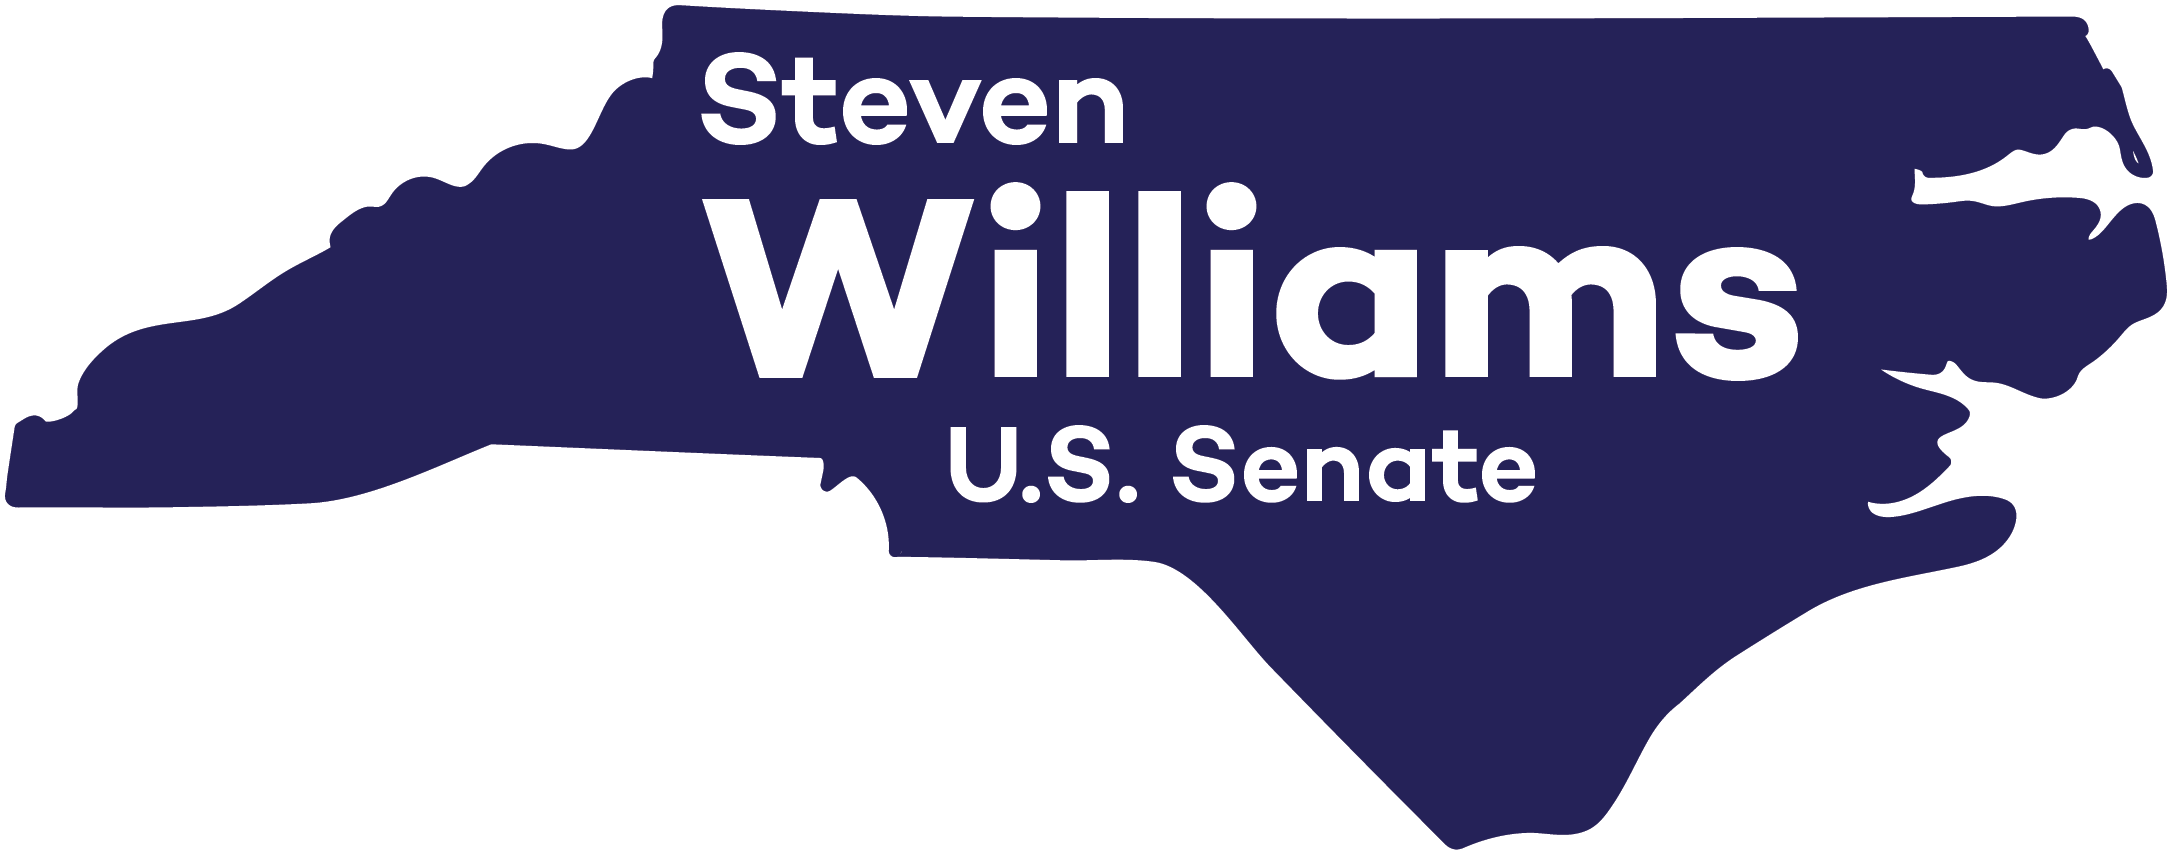 Steven Williams